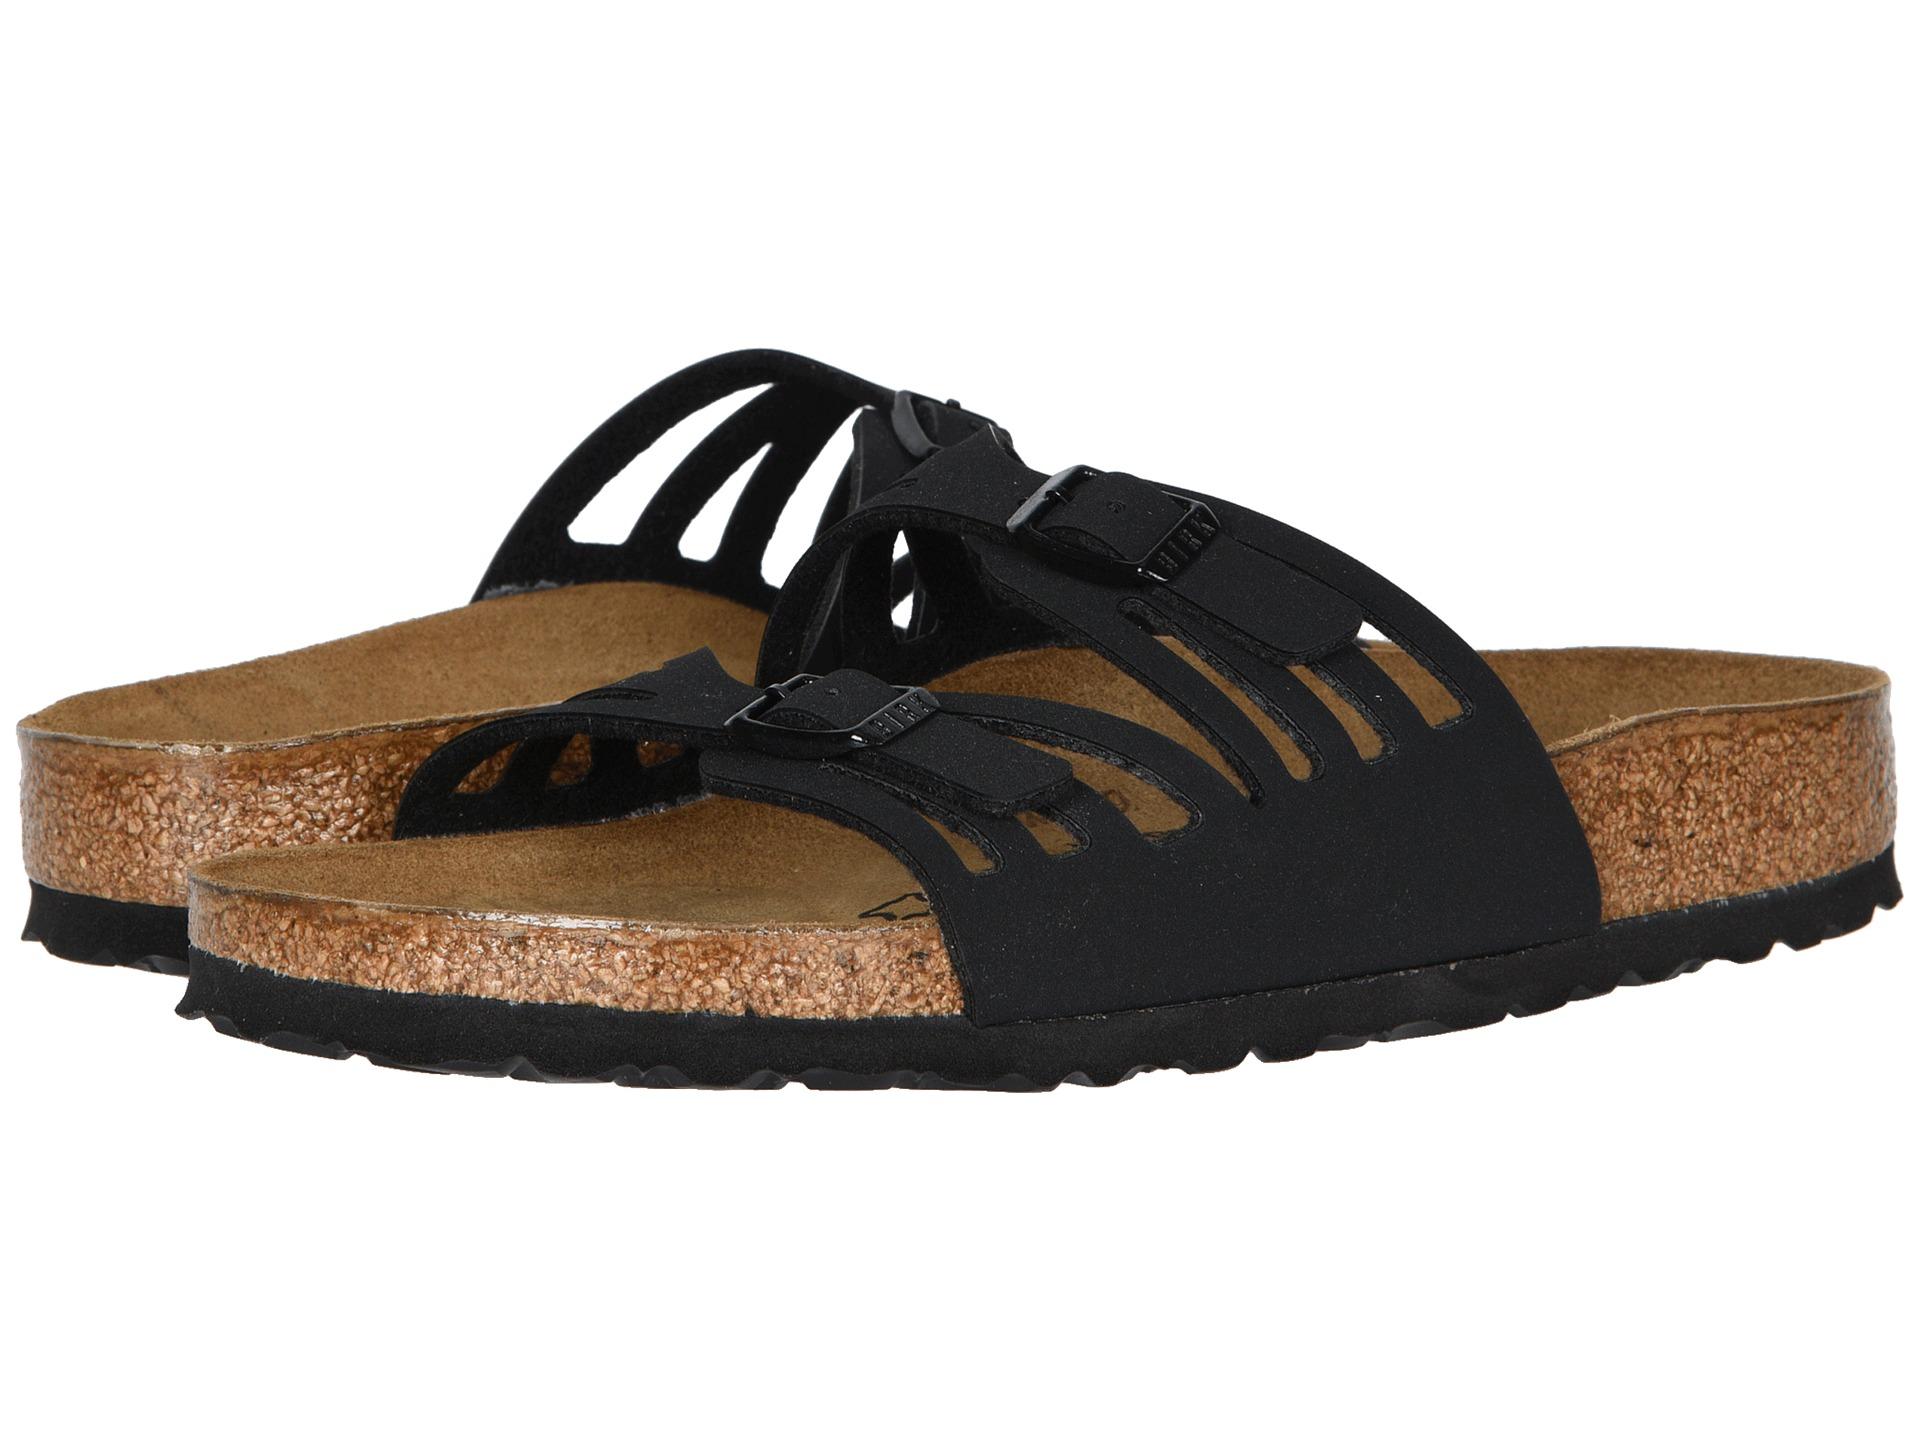 Best Sandals For Plantar Fasciitis: Birkenstock Gizeh Review